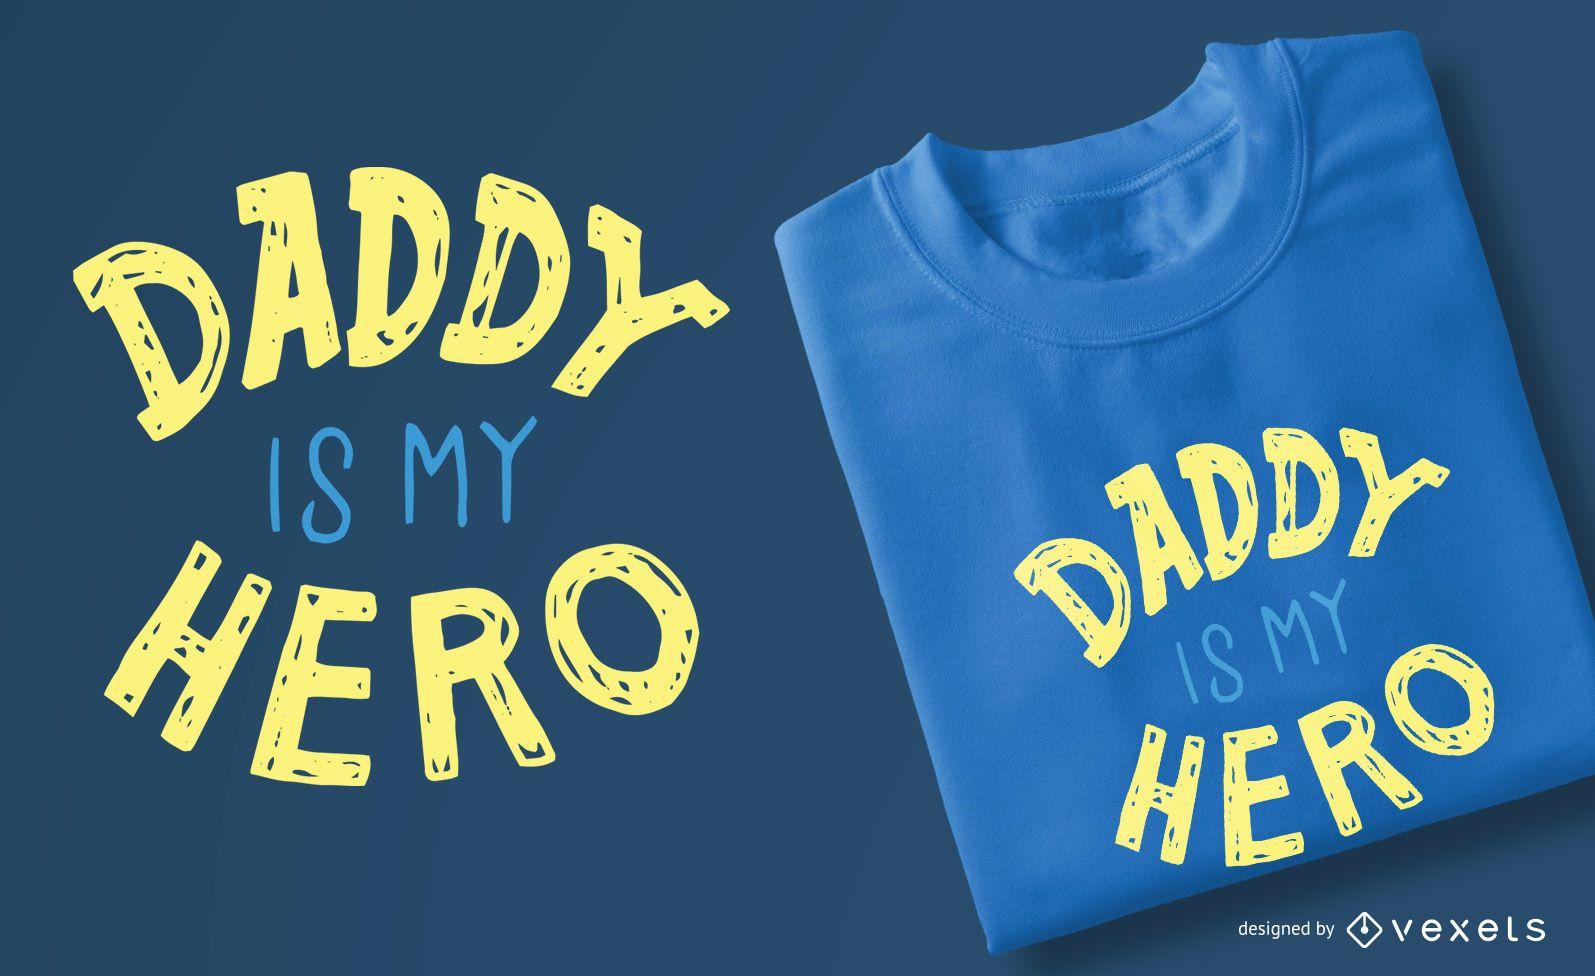 Daddy hero kids t-shirt design